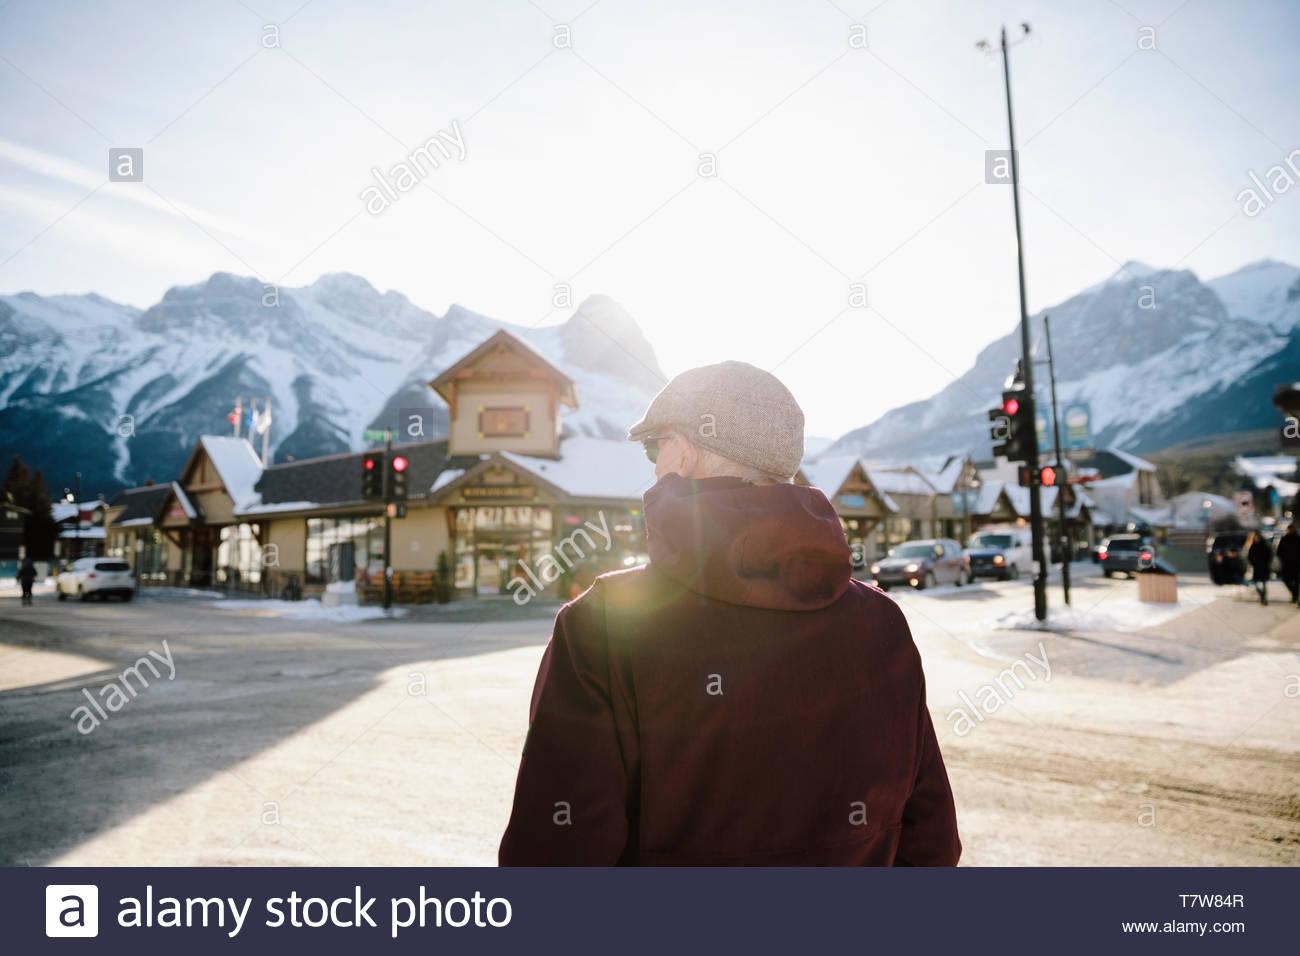 Man walking on sunny street in winter mountain town - Stock Image